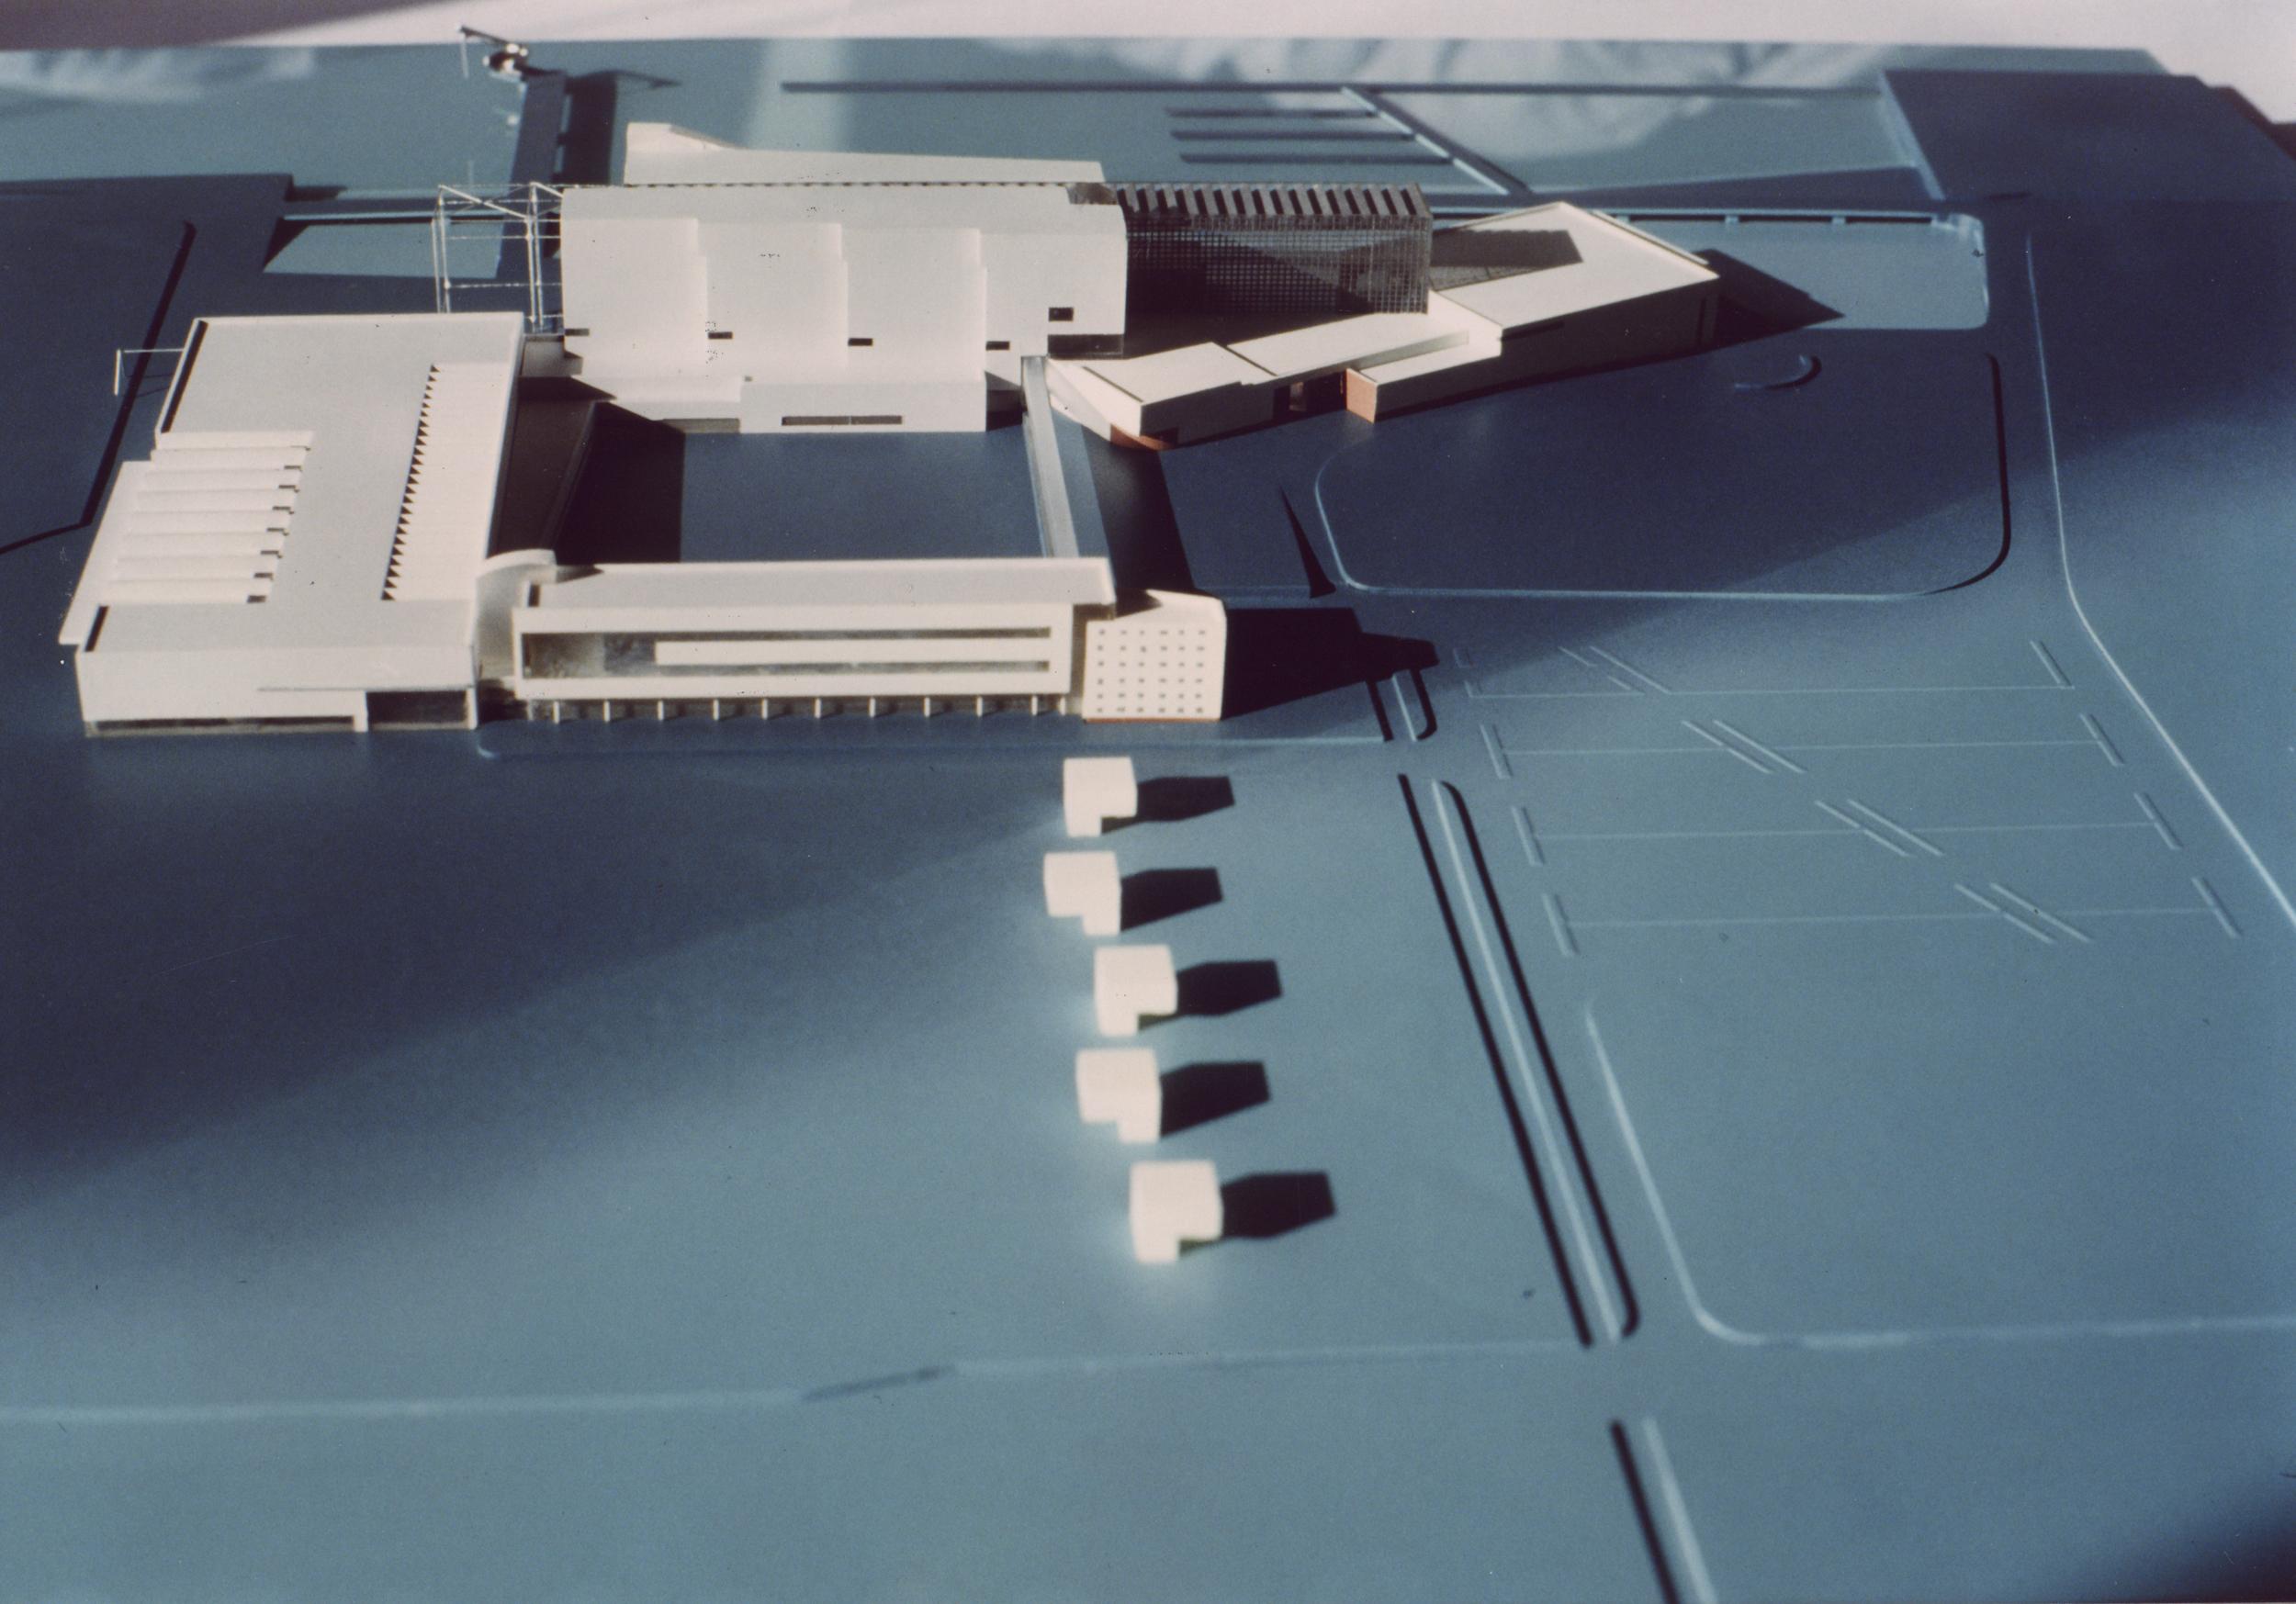 Nat. Inst. v. Maritieme Archeologie